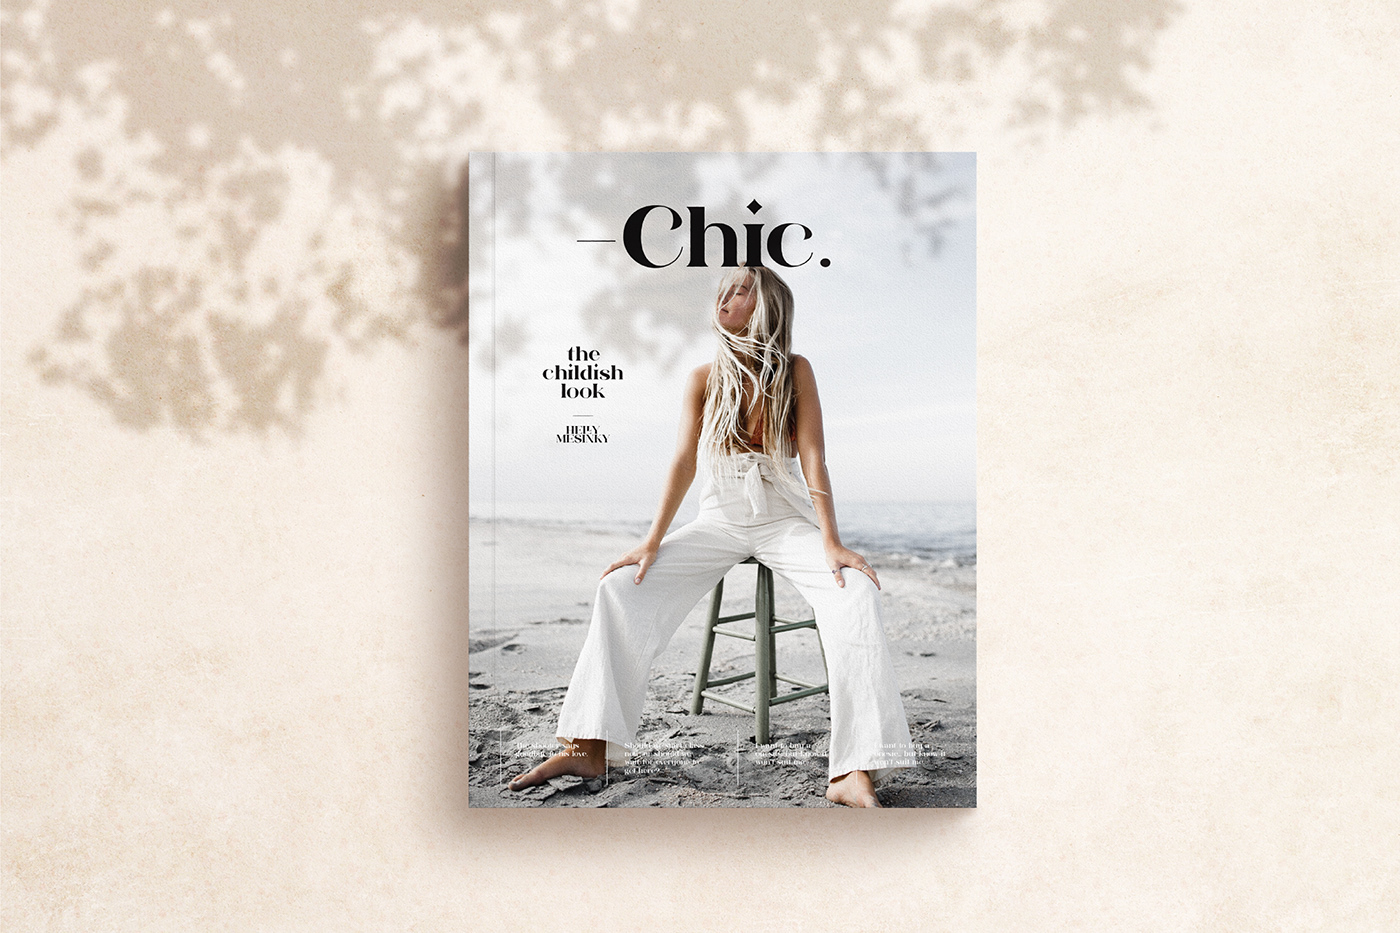 font serif modern chic fashionable chill relax logo branding